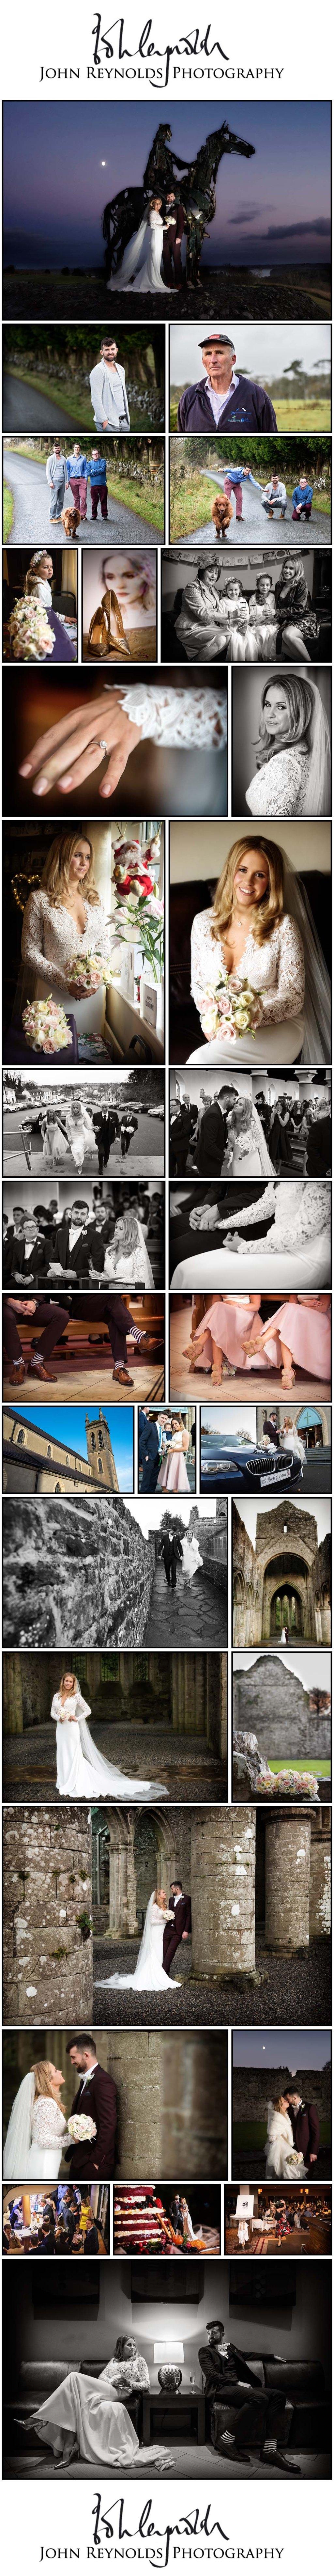 blog-collage-lorna-roch